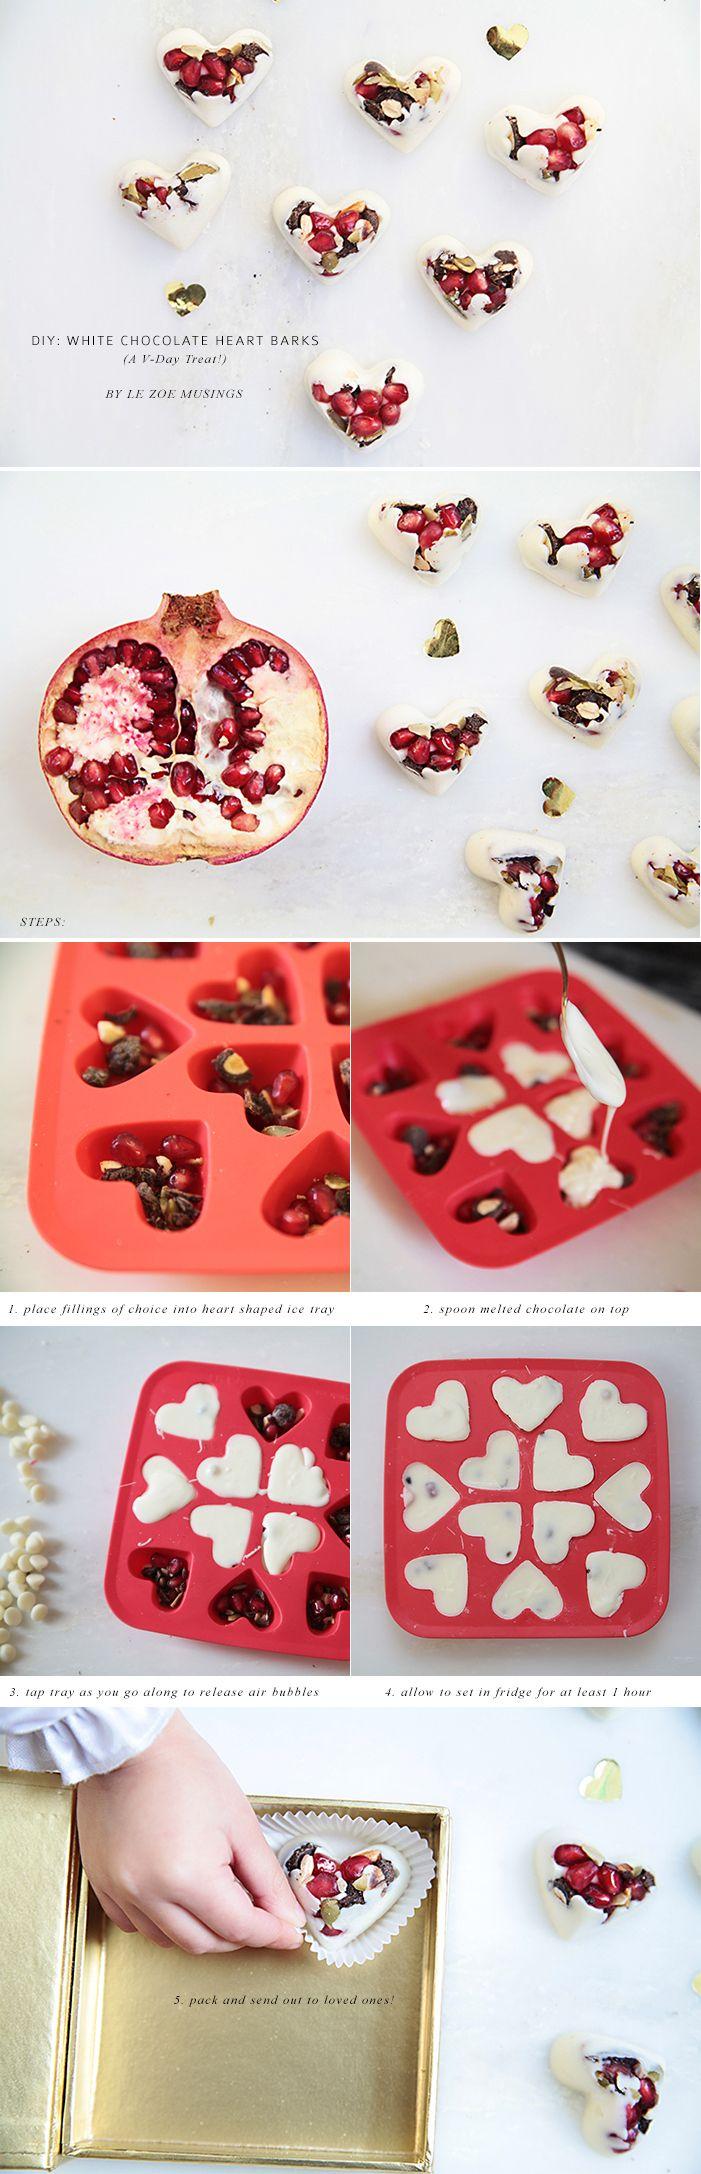 DIY Hoe to make White Chocolate Heart Barks.